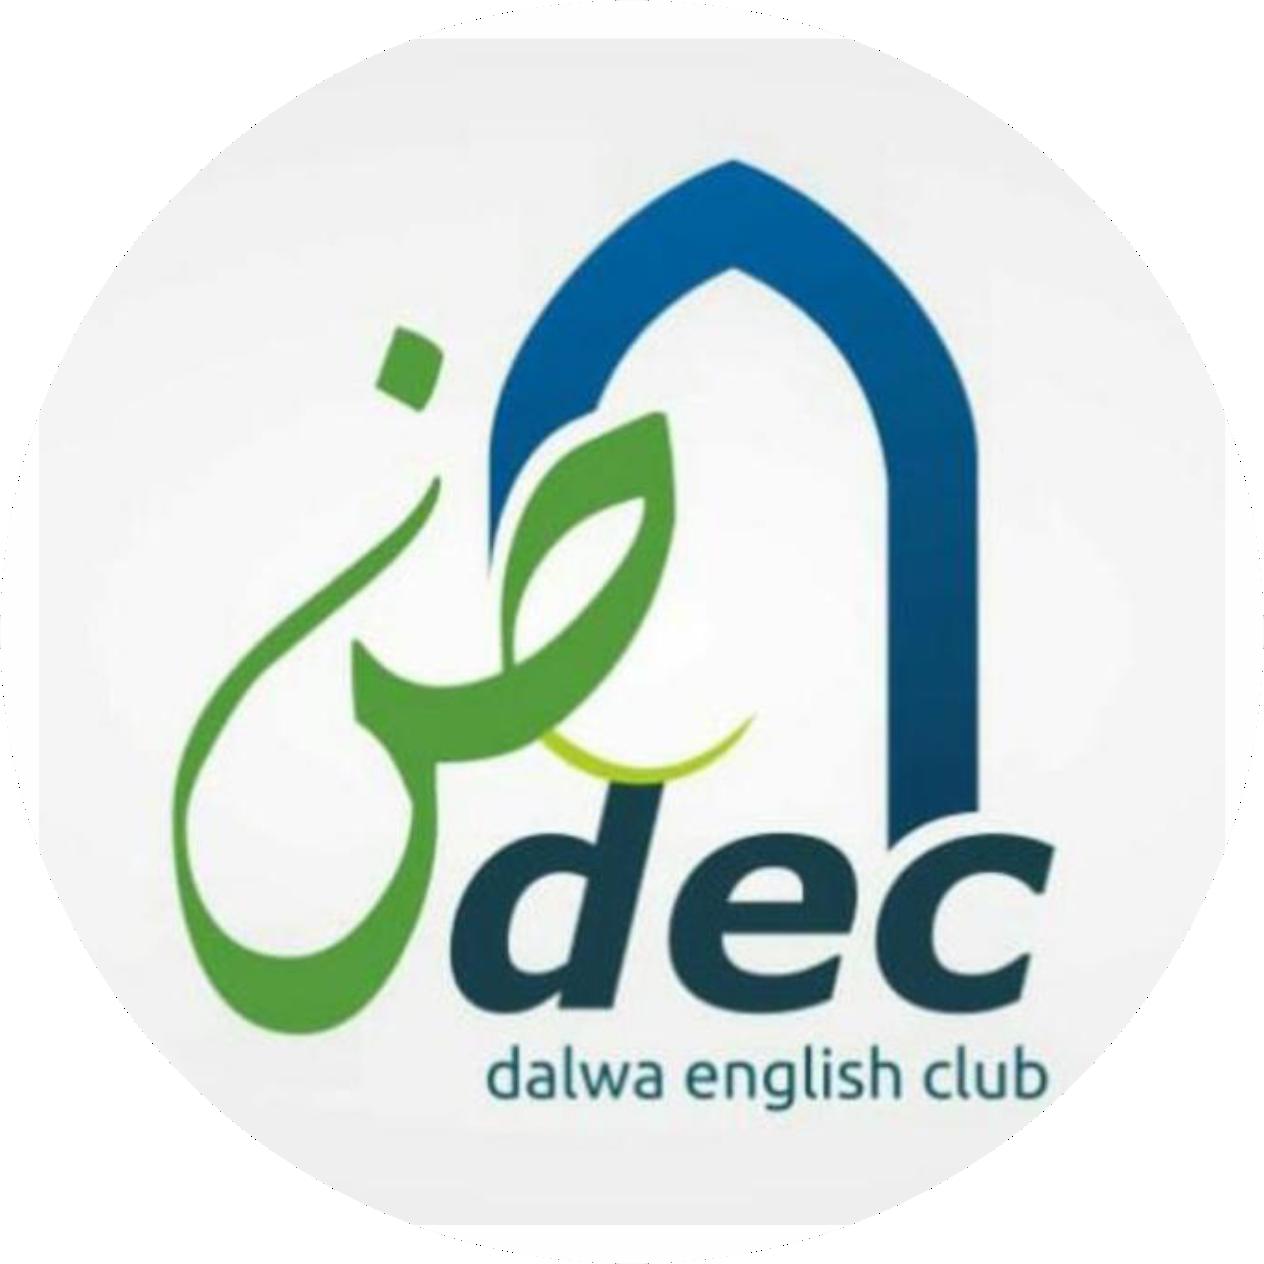 Dalwa English Club